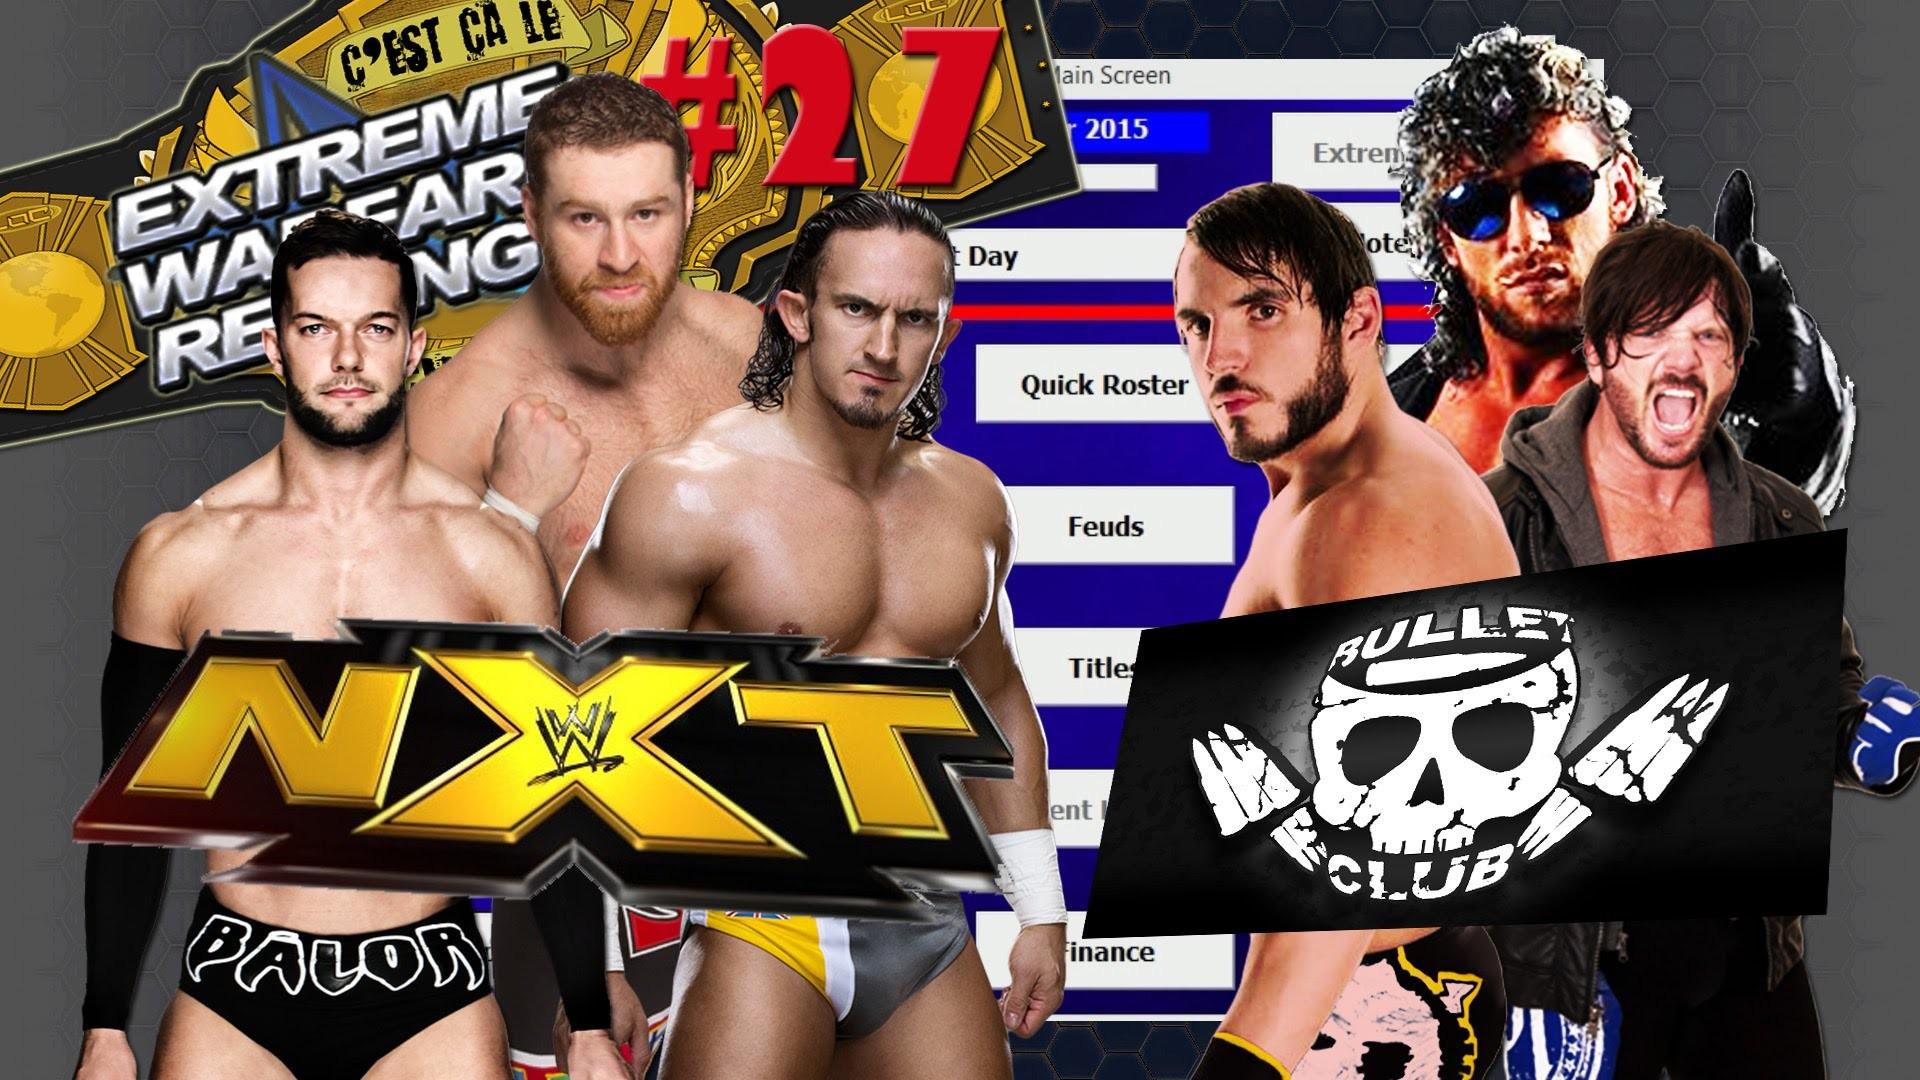 Extreme Warfare Revenge #27 – NXT vs. Bullet Club [HD – FR]